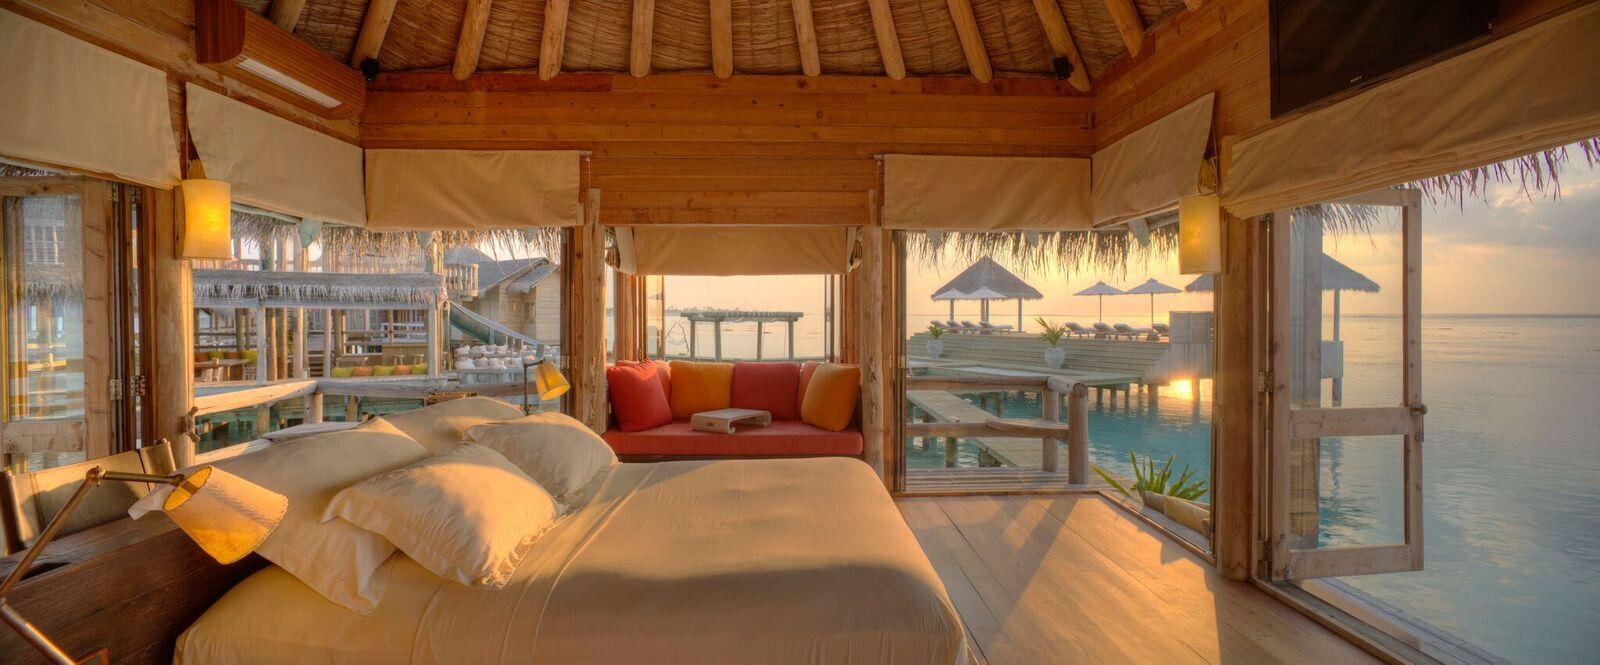 Private Reserve Master Suite Bedroom at Sunsrise